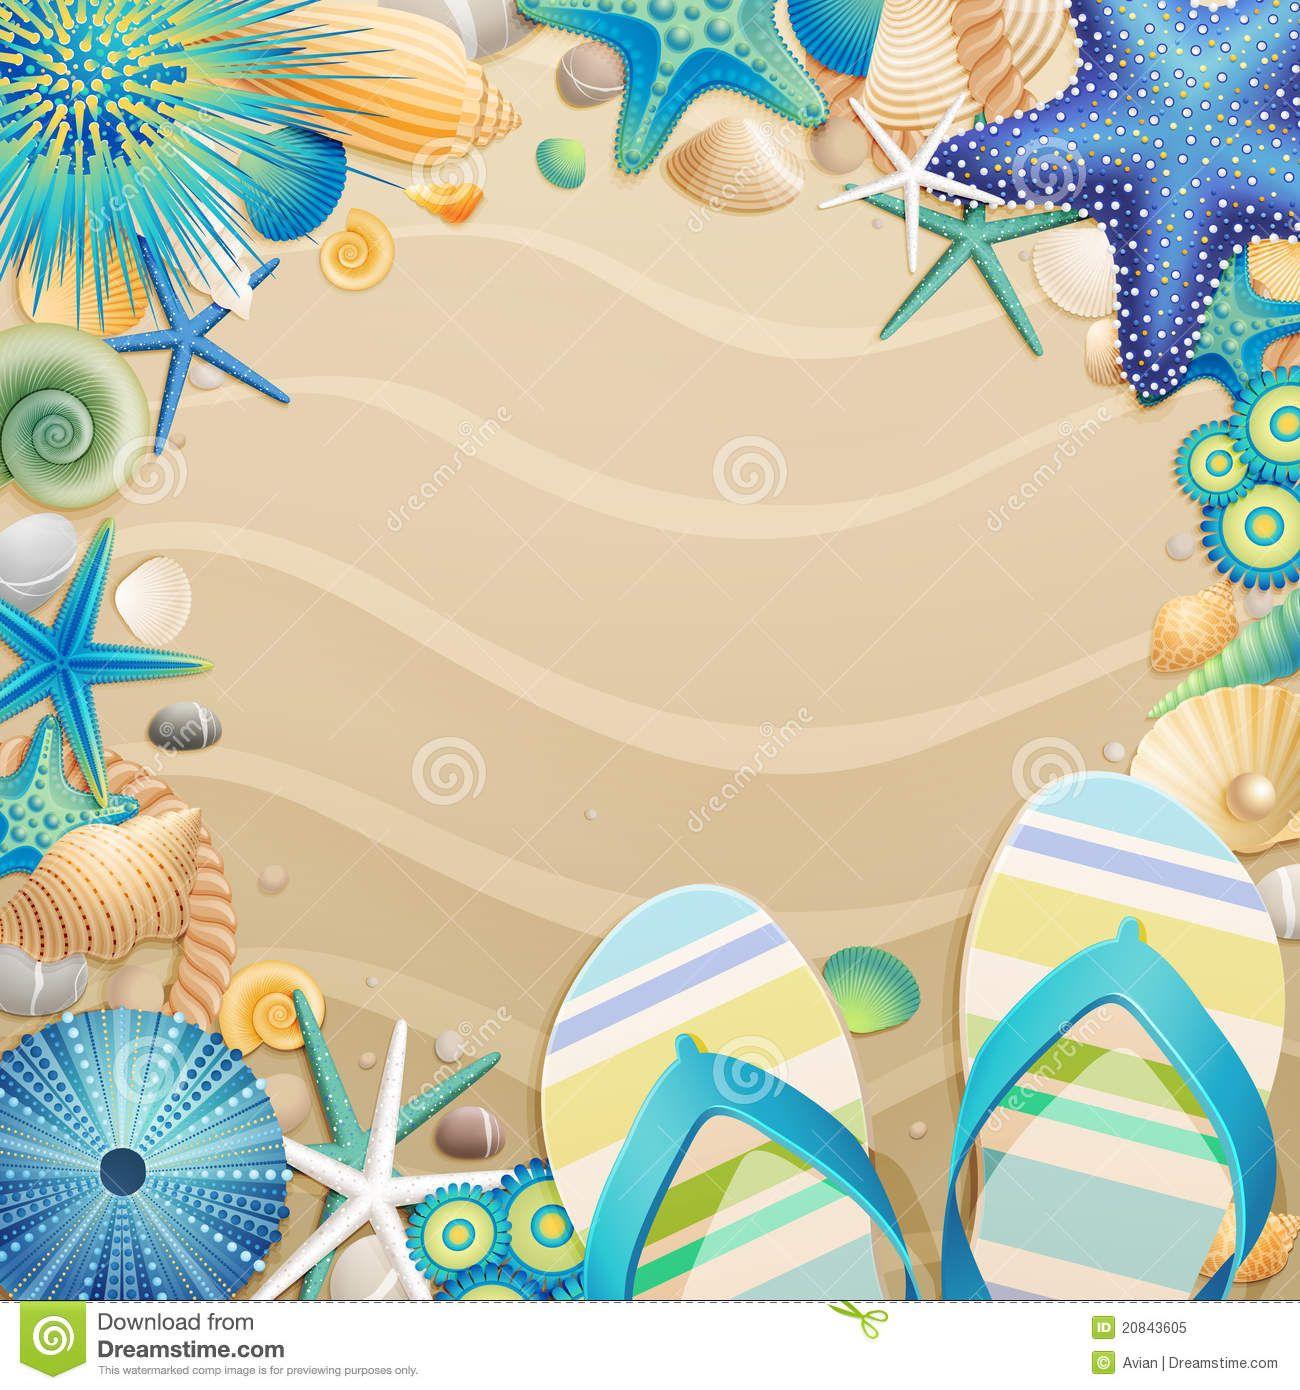 Free images of flip. Beach clipart beach theme